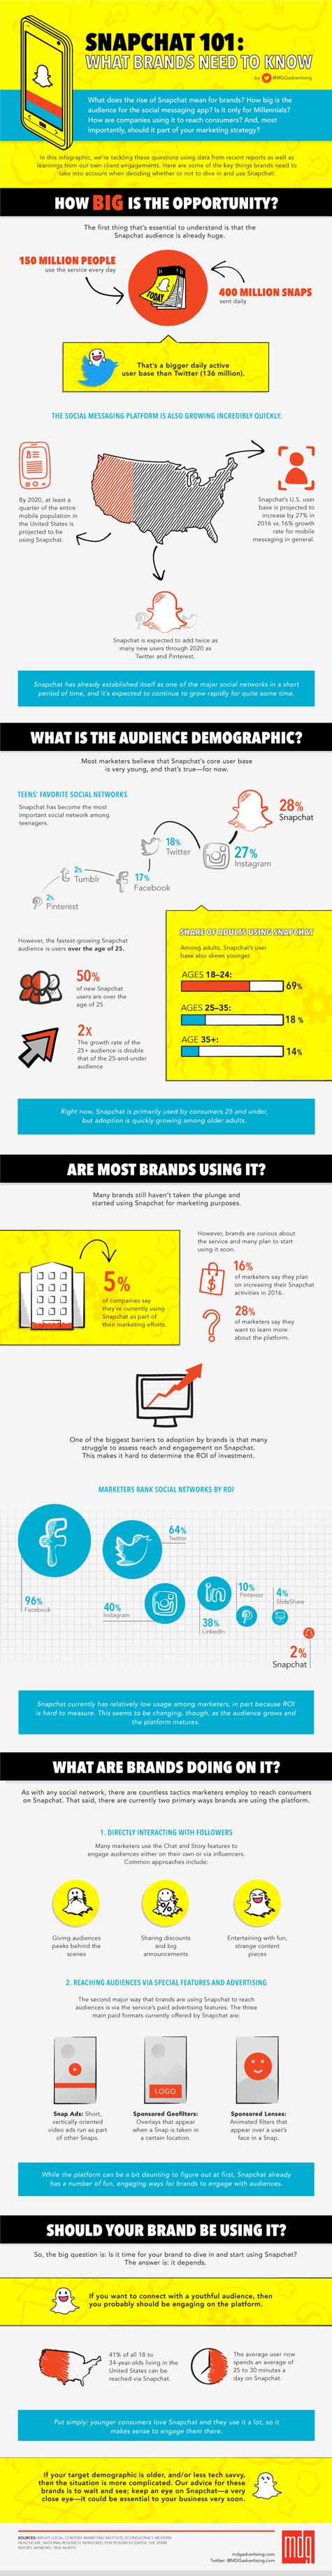 infografik snapchat 101